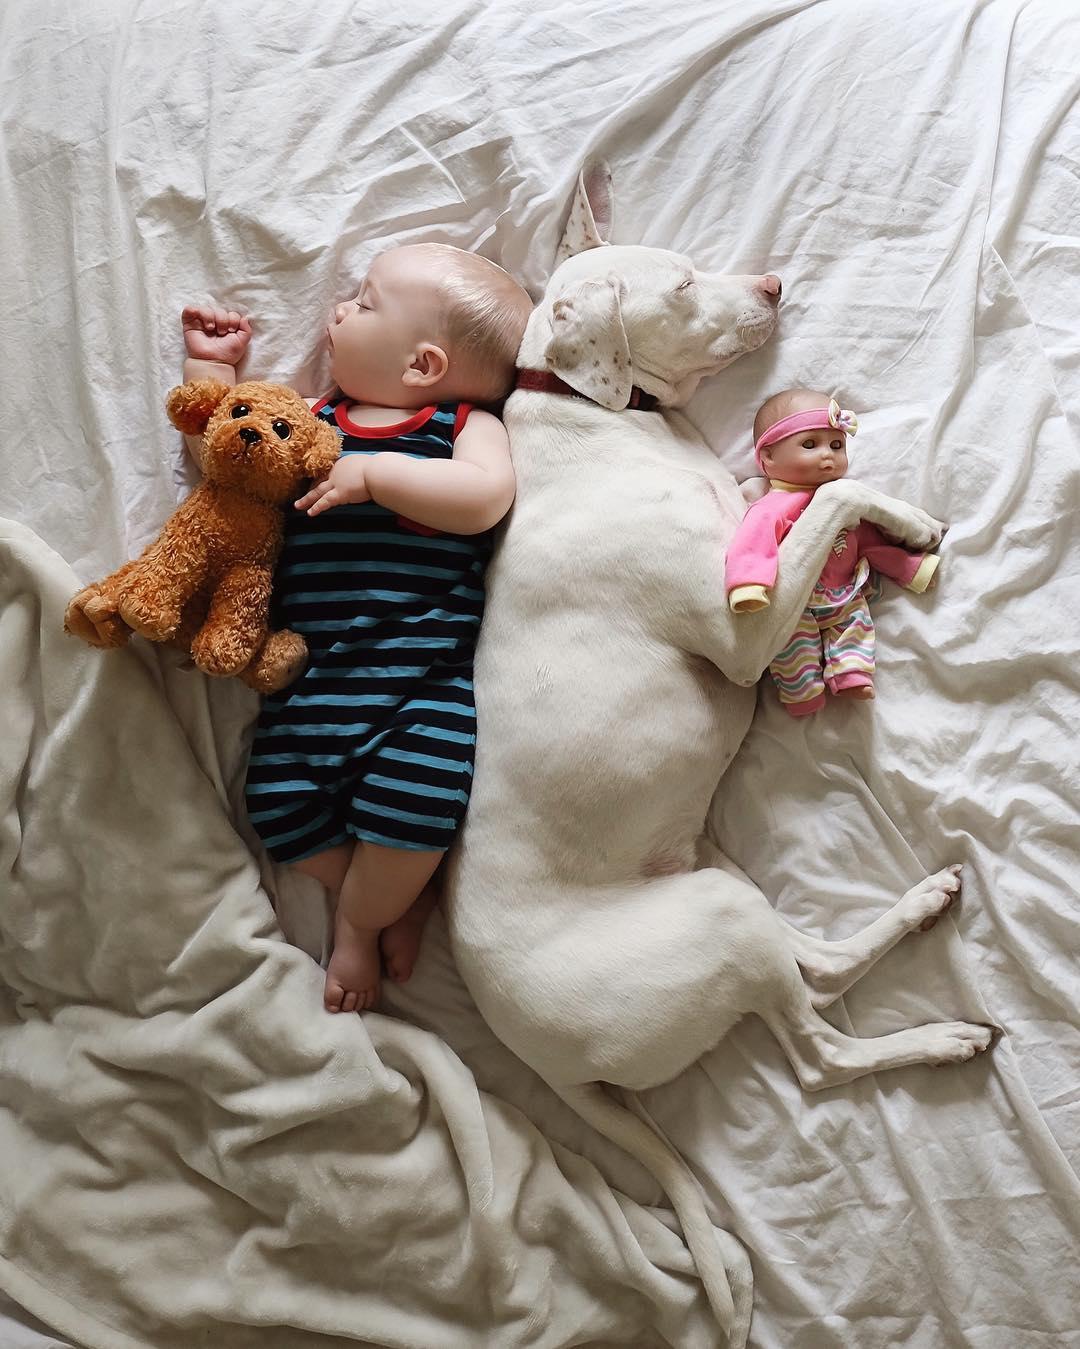 cane dorme con la bambina2